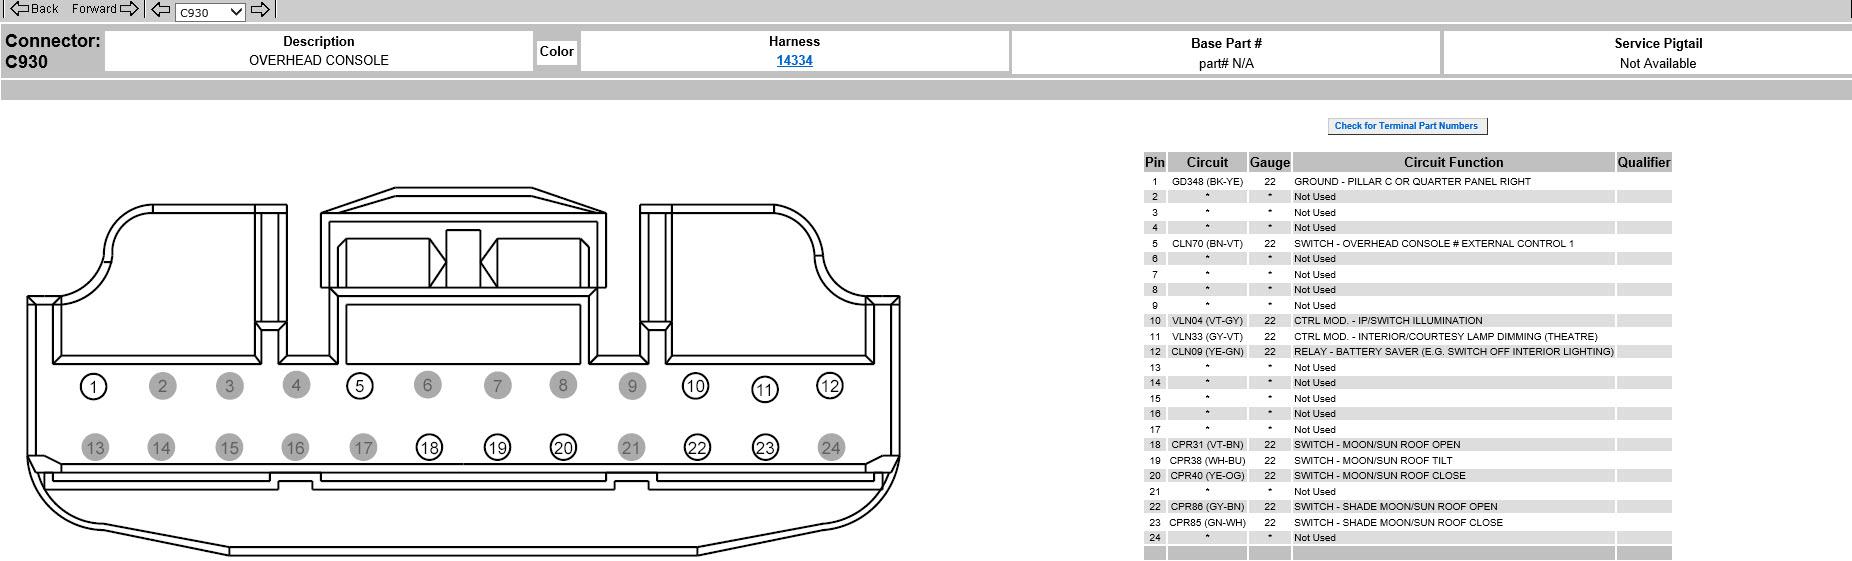 hight resolution of  xlt 302a sun visor upgrade c930 connector jpg